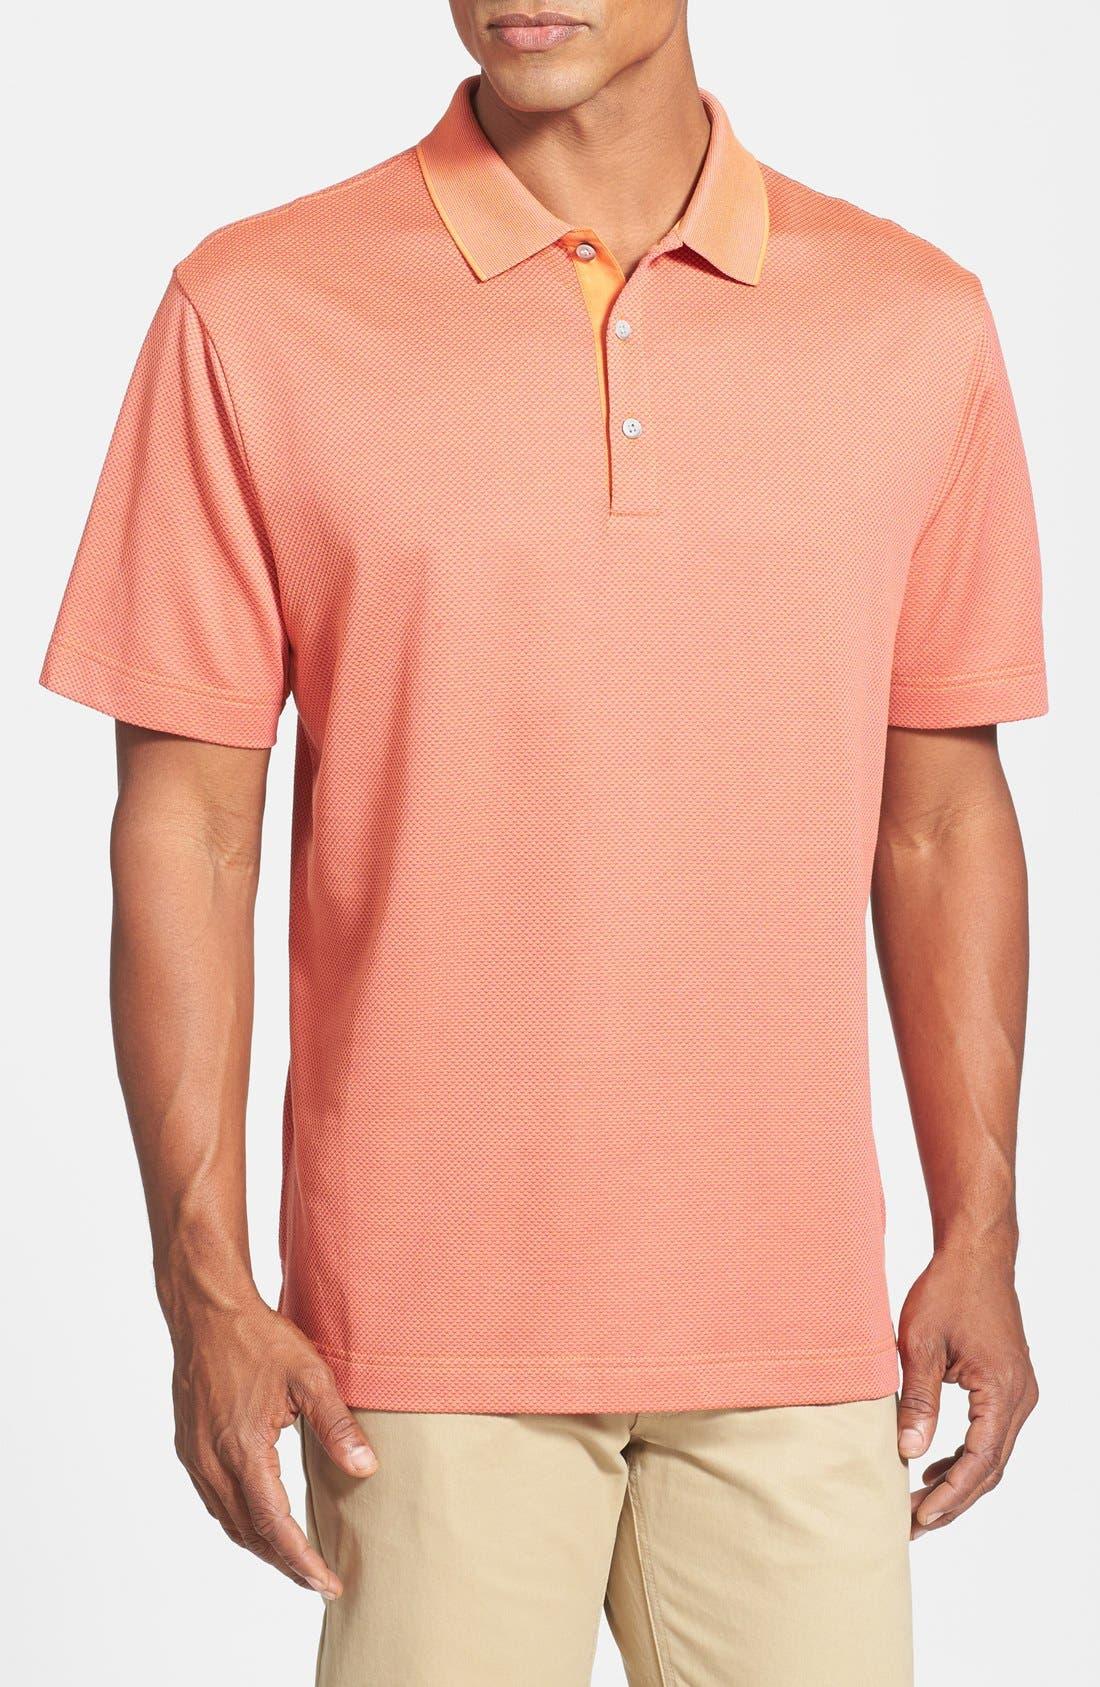 Main Image - Cutter & Buck 'Nano' Wrinkle Free DryTec Golf Polo